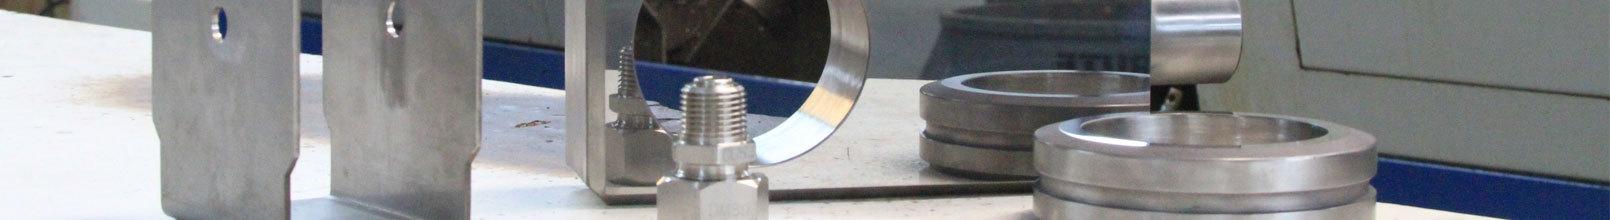 fls-gate-valve-parts.jpg